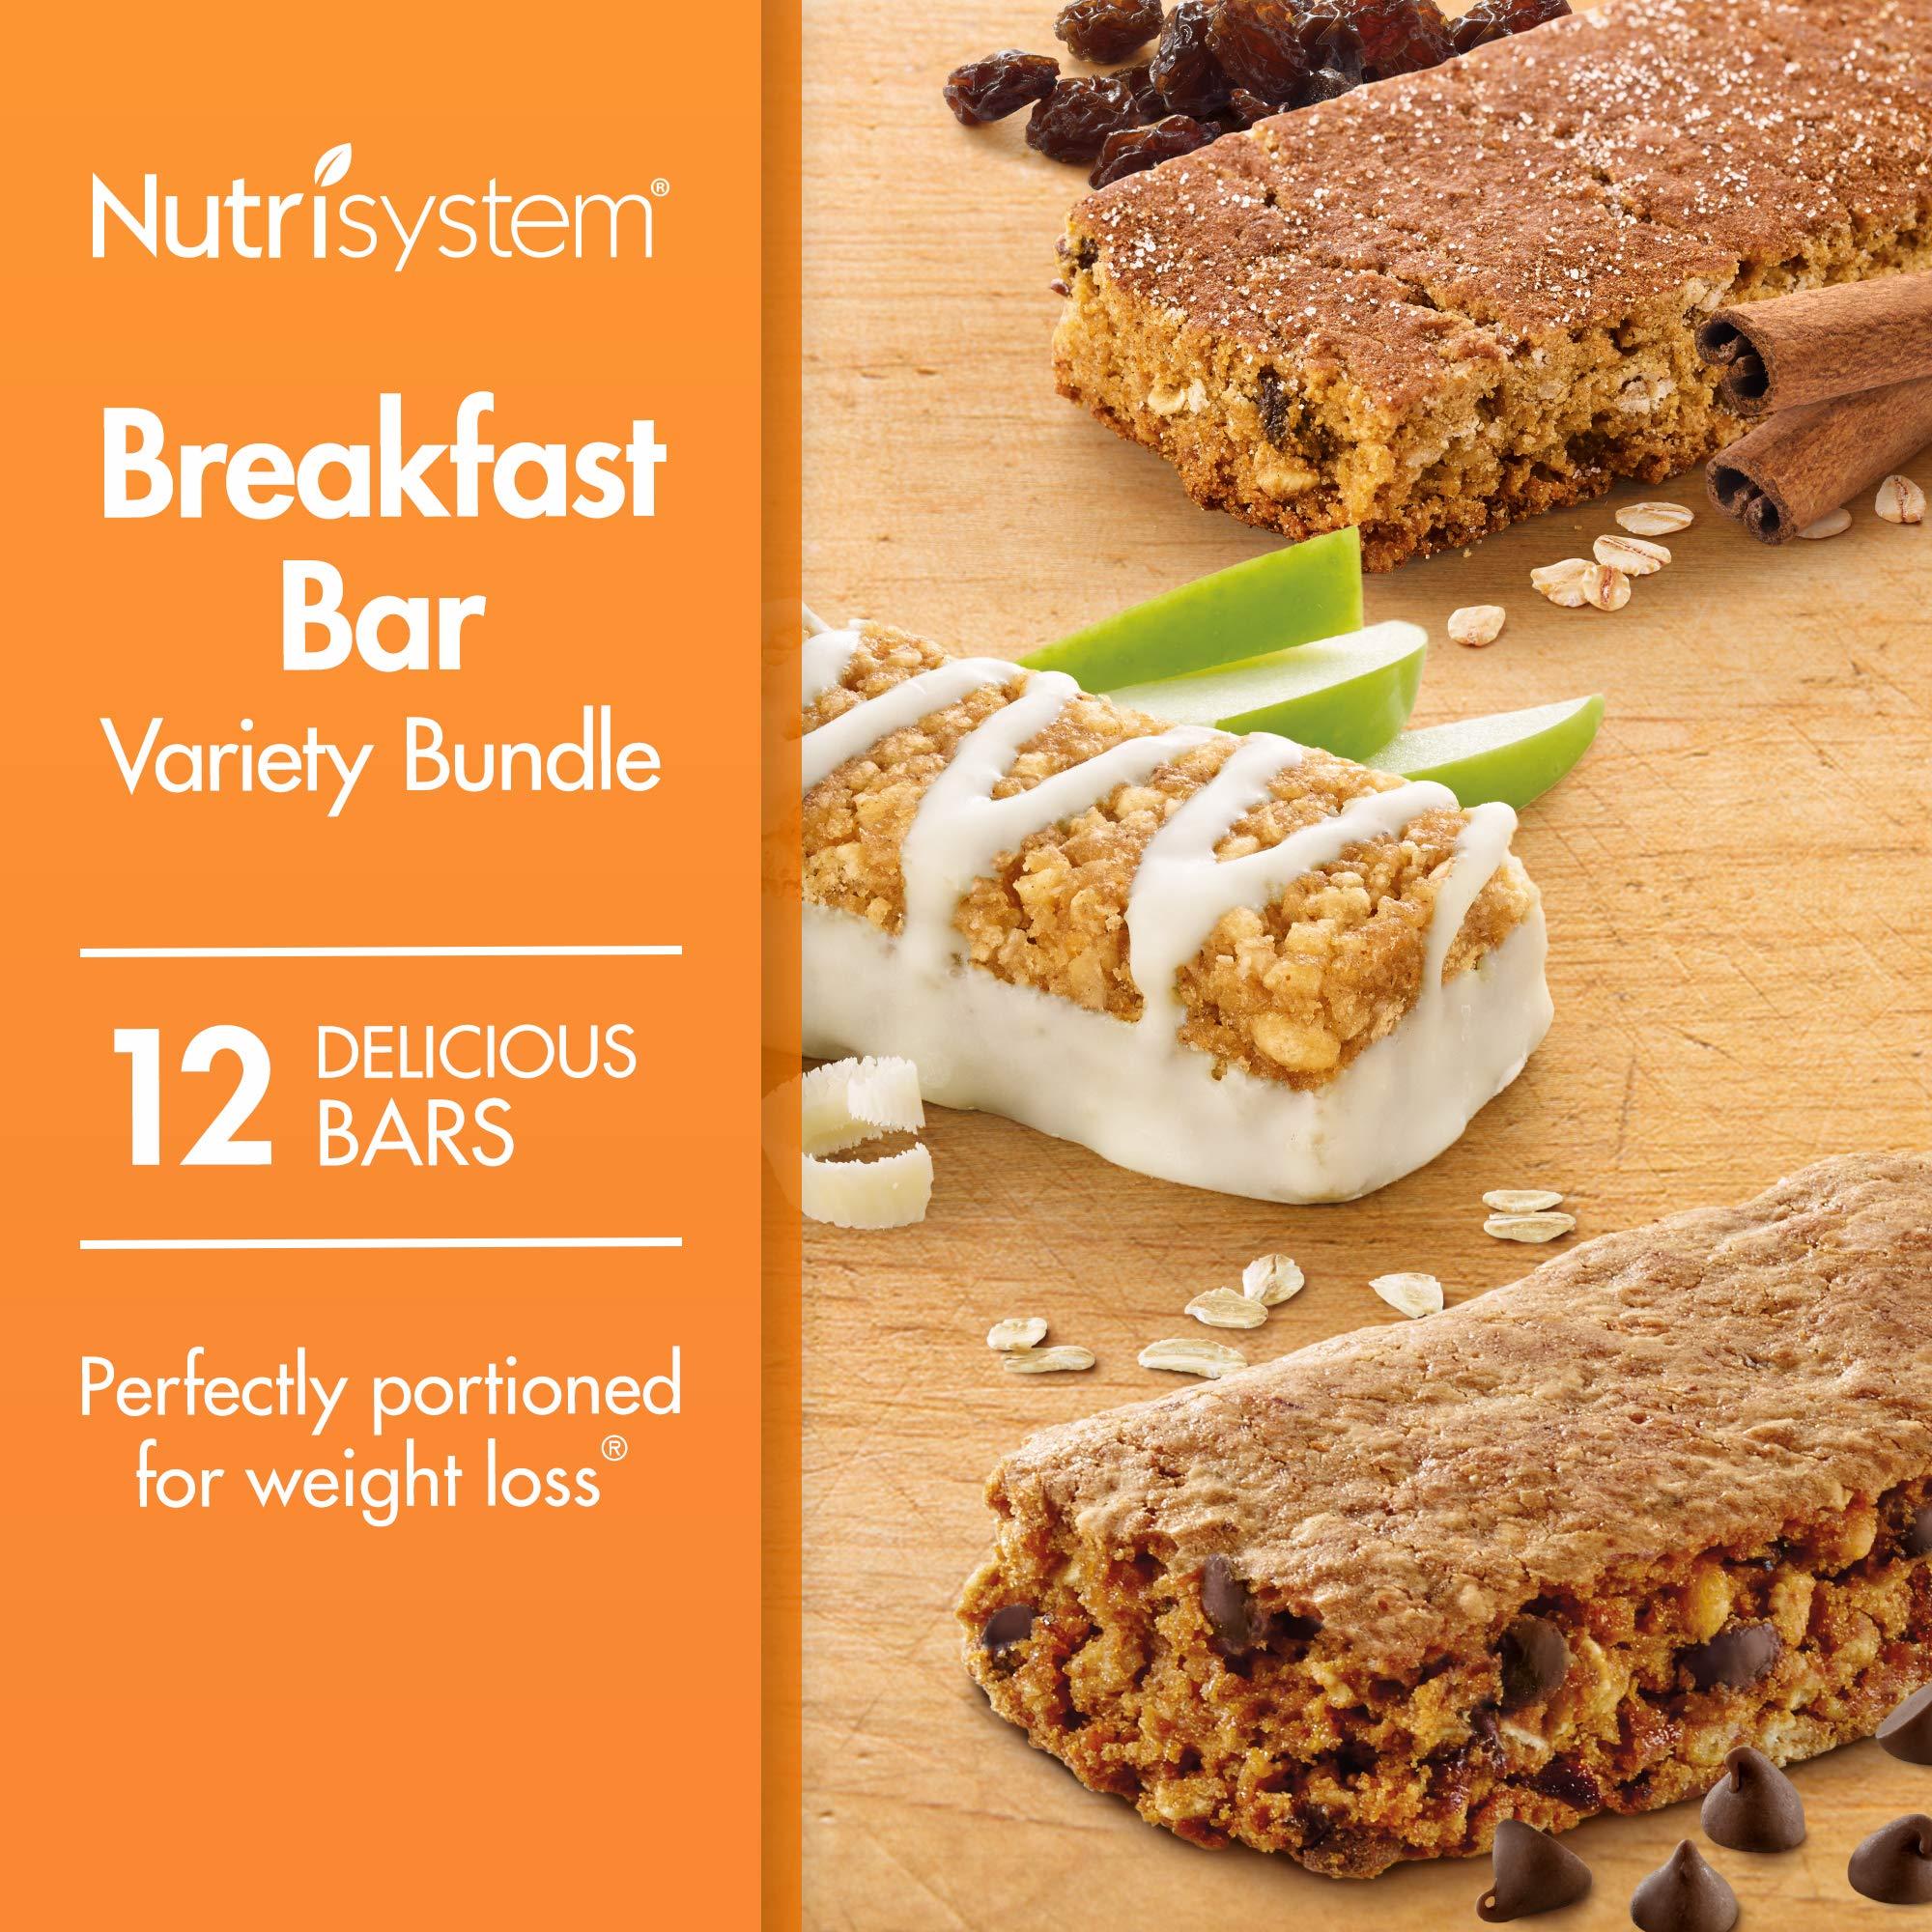 Nutrisystem® Breakfast Bar Variety Bundle, 12 Count Bars